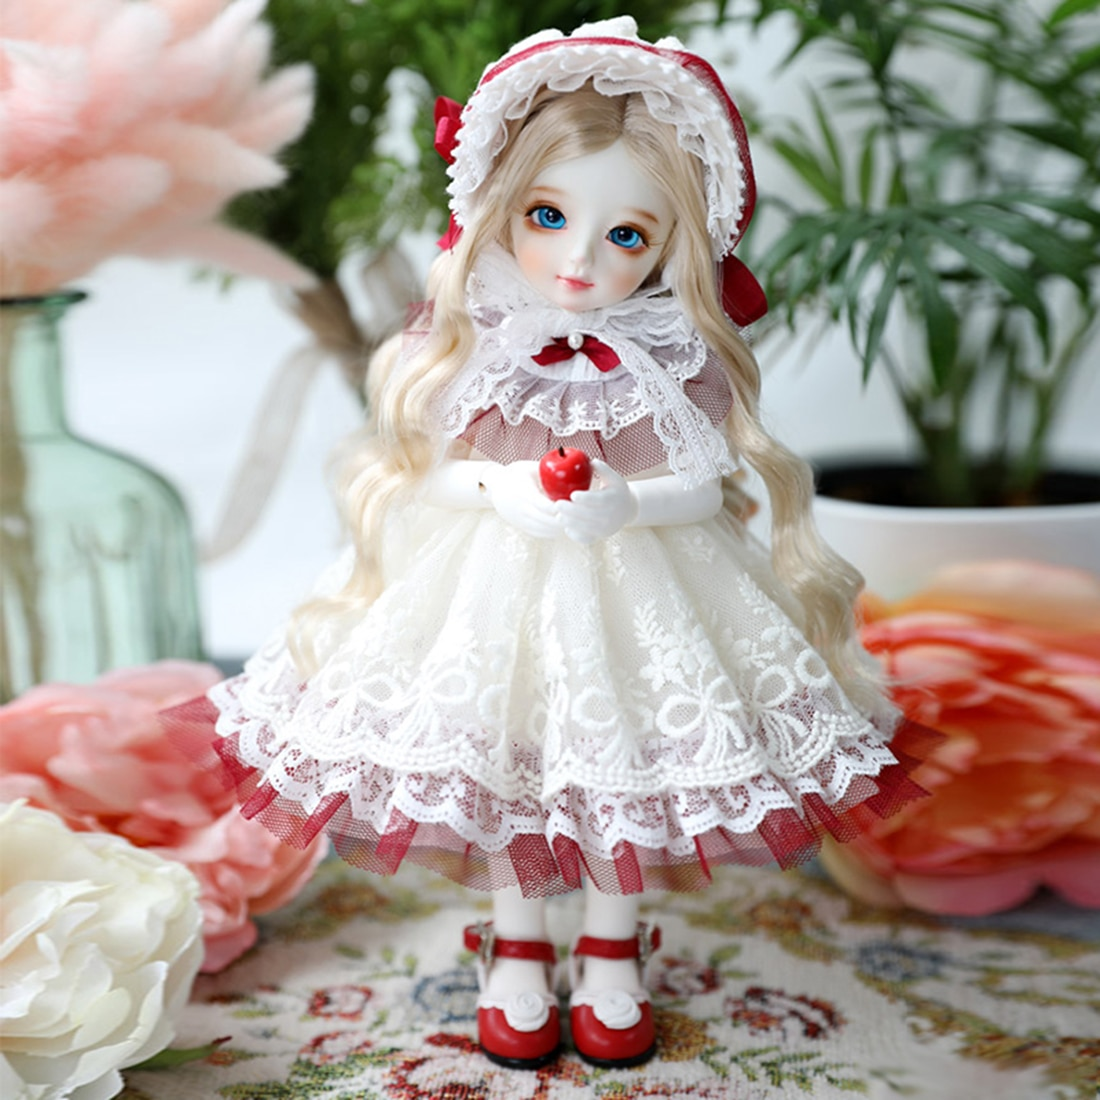 Conjunto de 3 muñecas, accesorios, capota roja, conjunto de ropa para 1/3 1/4 1/6, muñecas BJD, sin muñeca